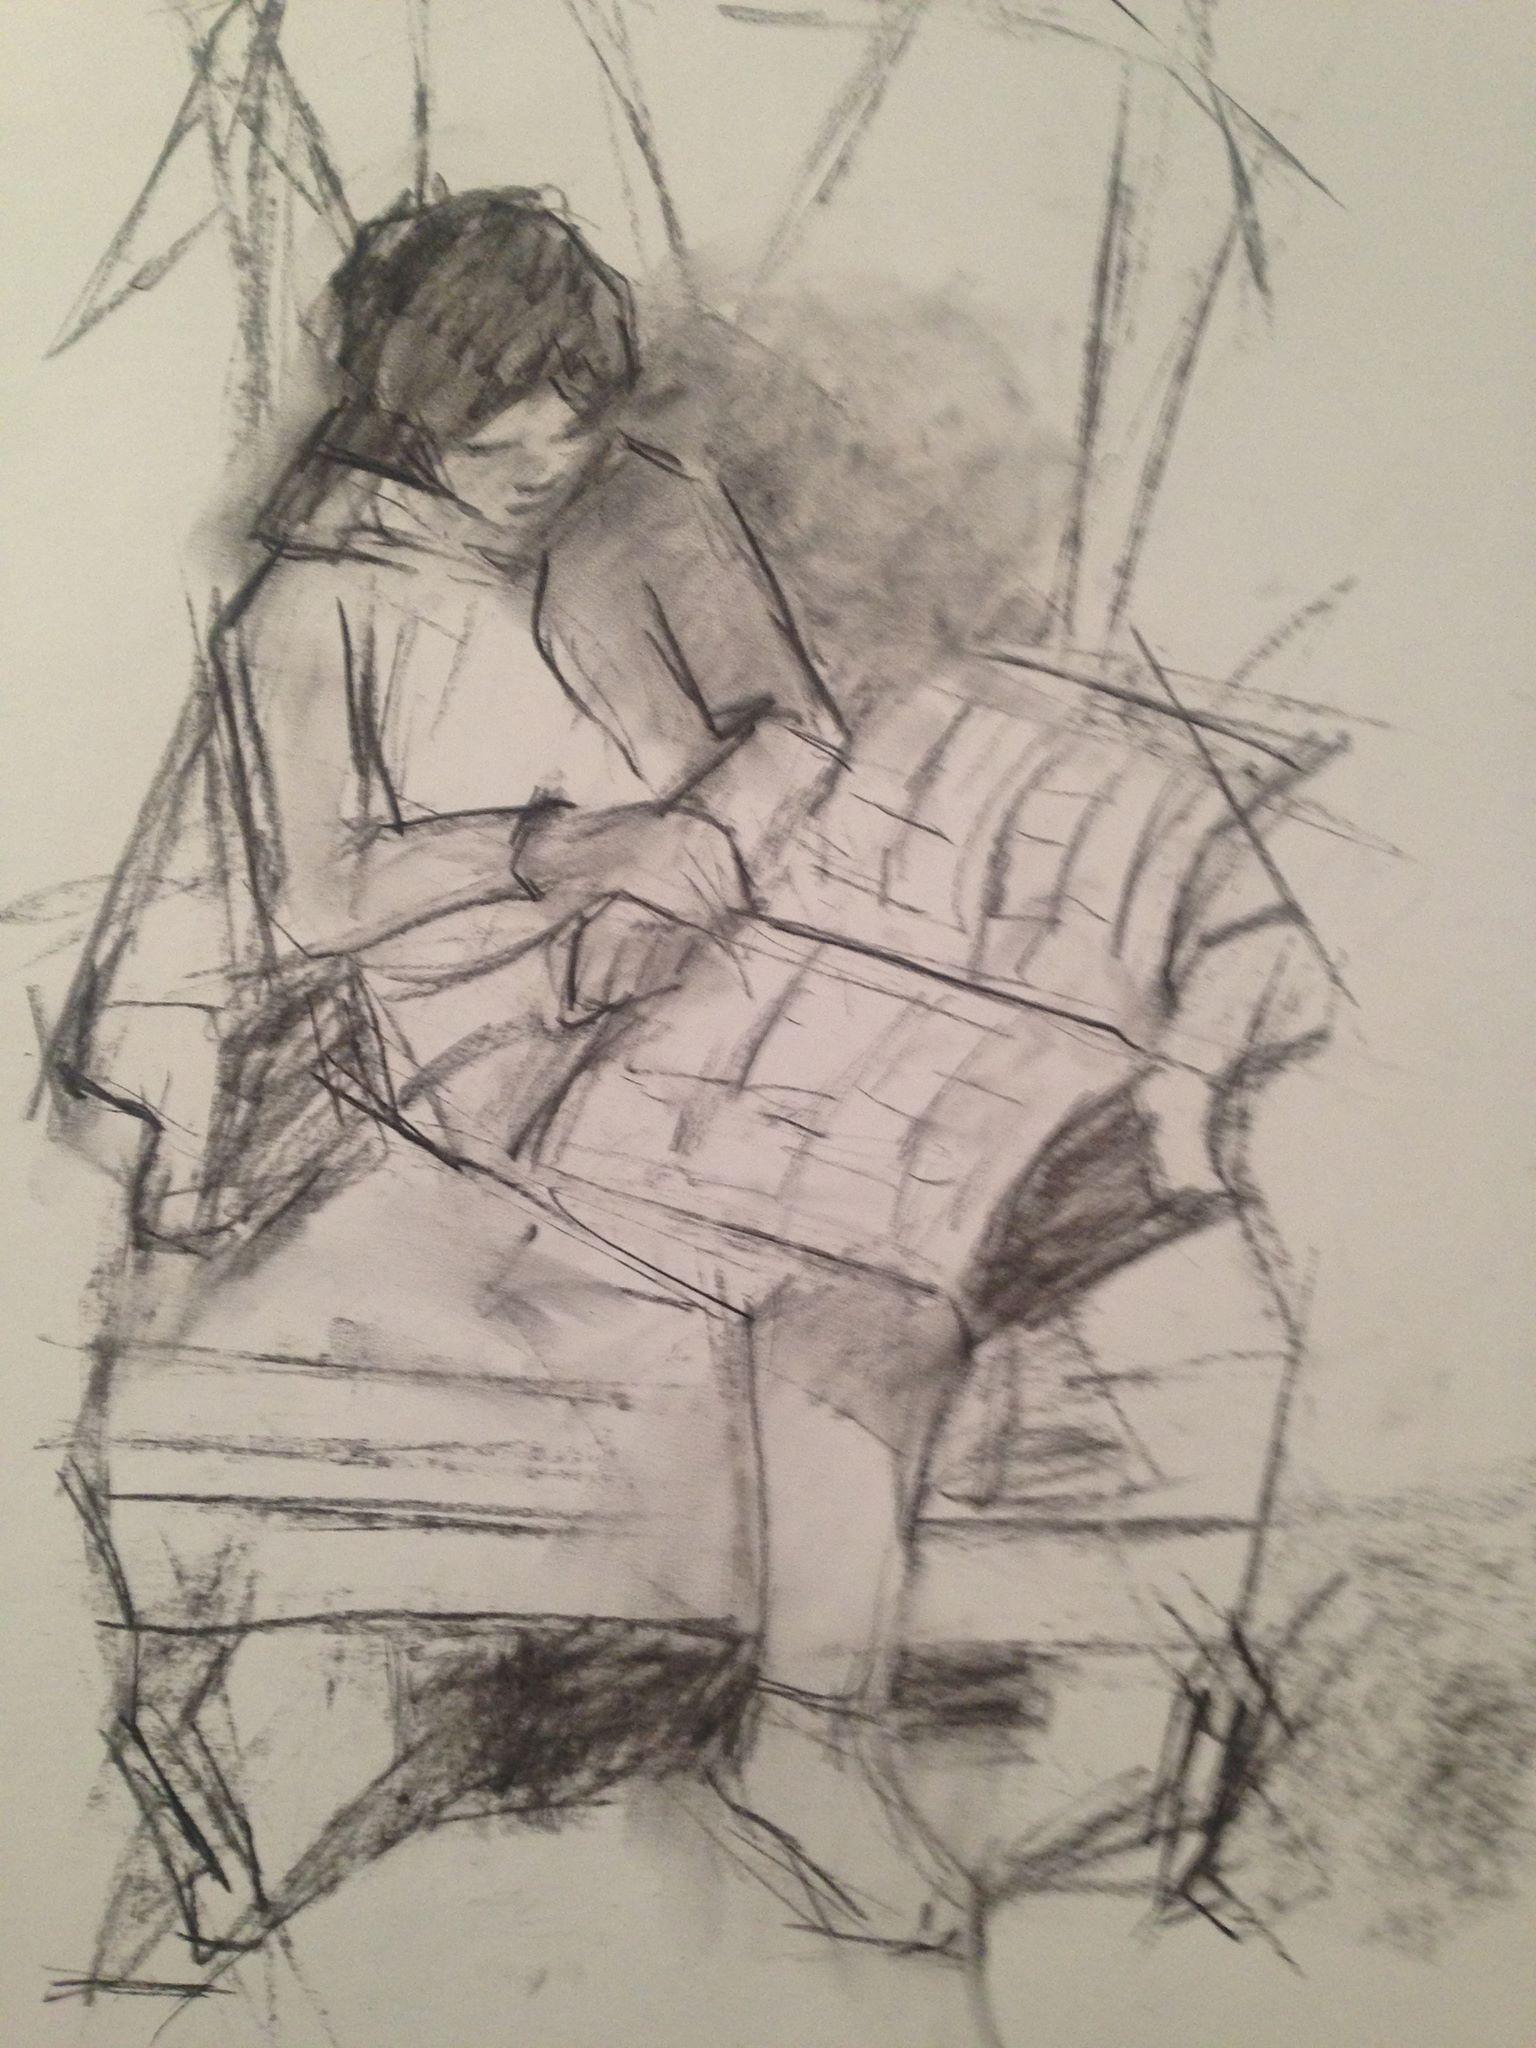 Morgan reading comic books.  charcoal, 18x24 inches